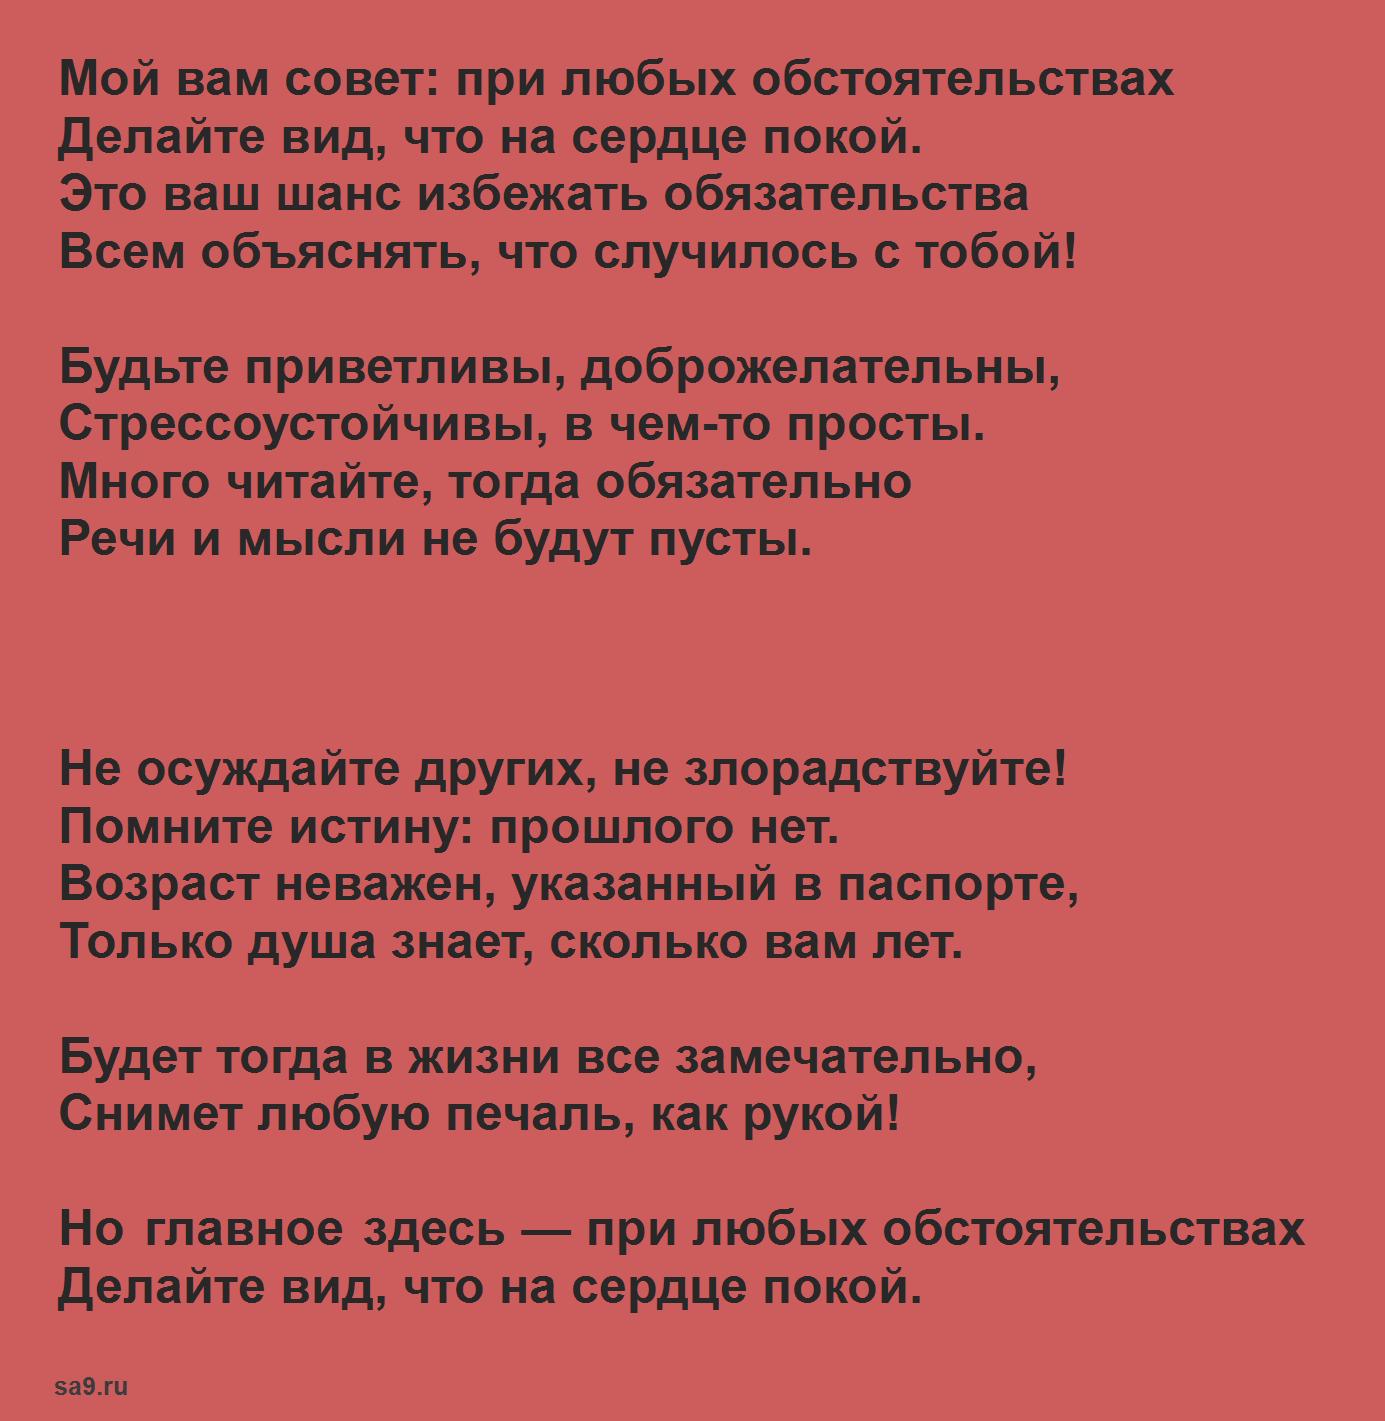 Астахова стихи - Совет